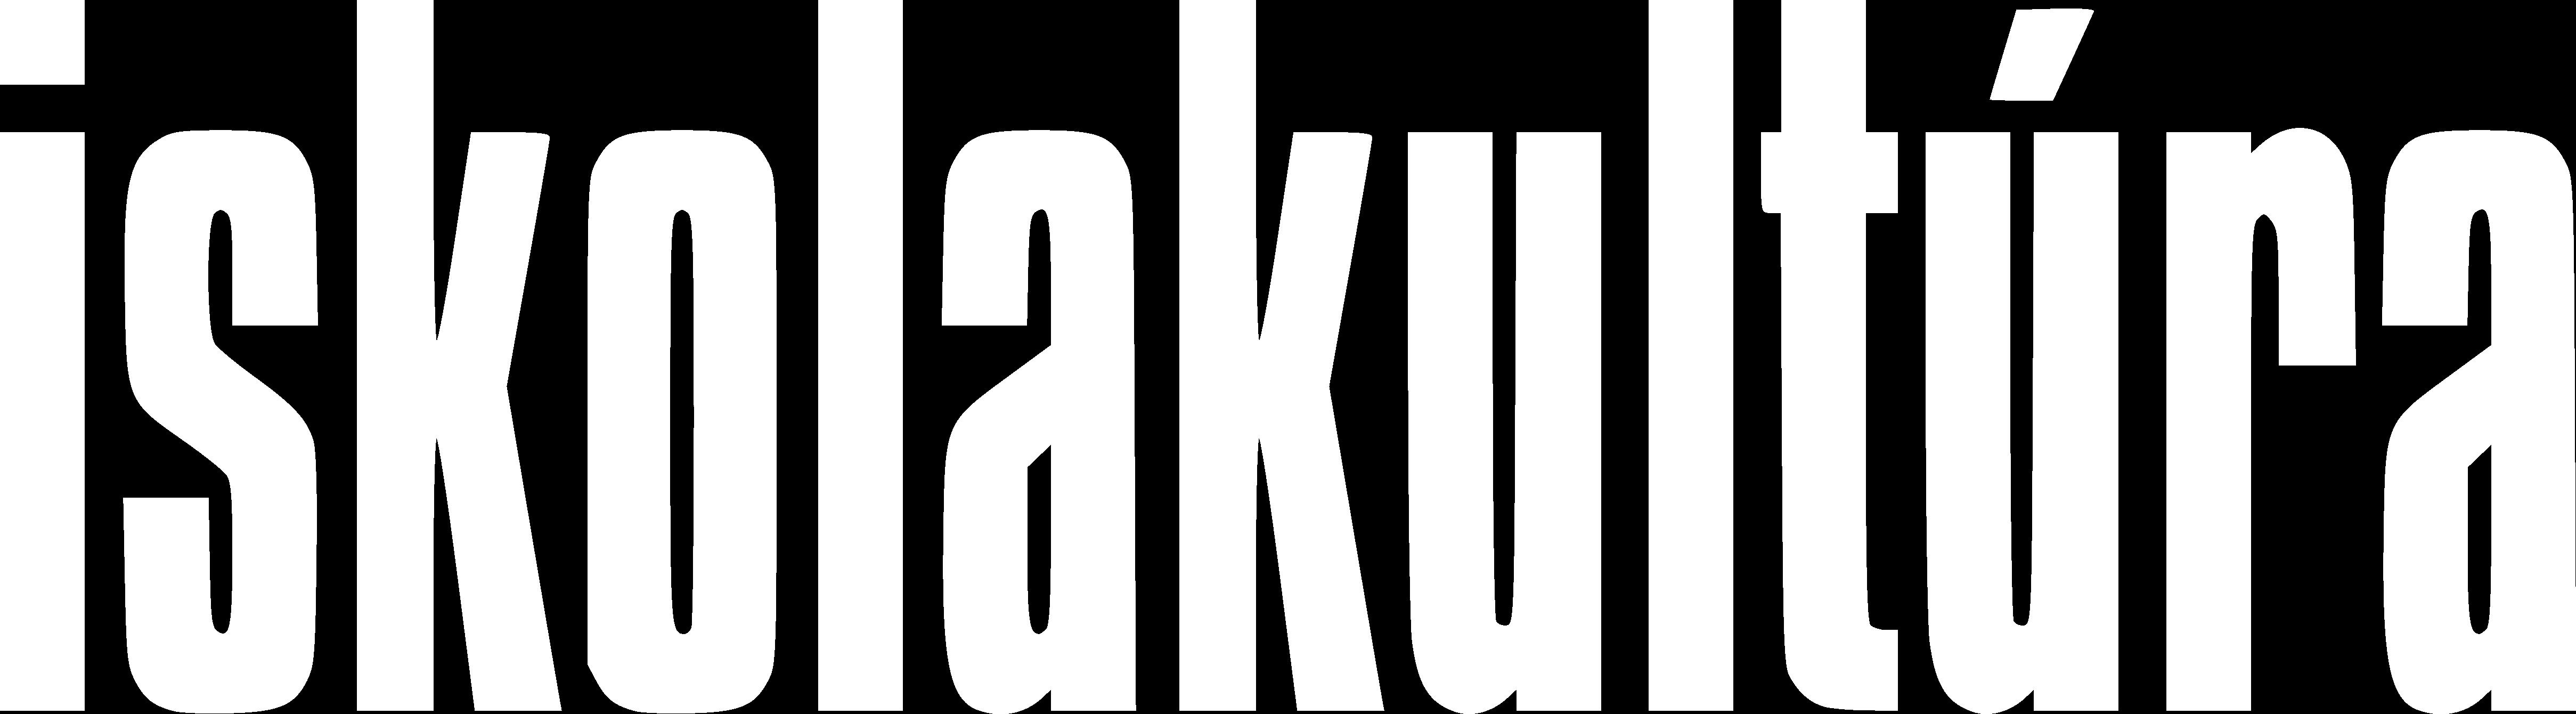 iskolakultura logo